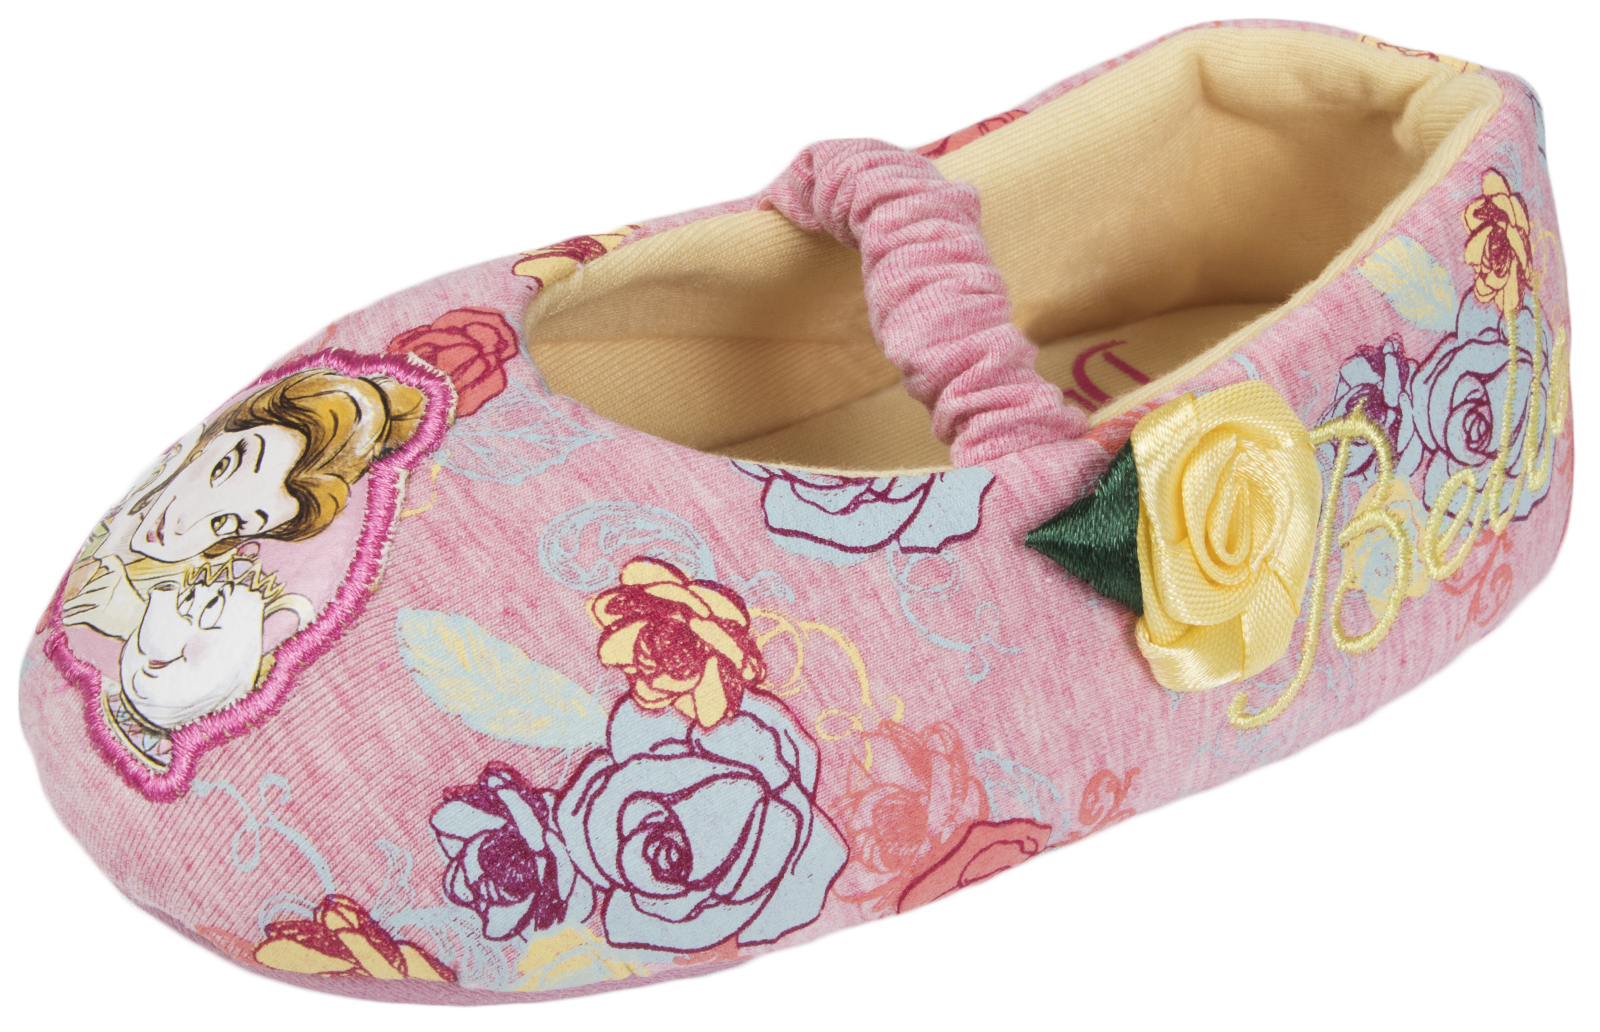 DISNEY Princess Pantofole Belle carattere Scarpine LA BELLA E LA BESTIA Tg UK